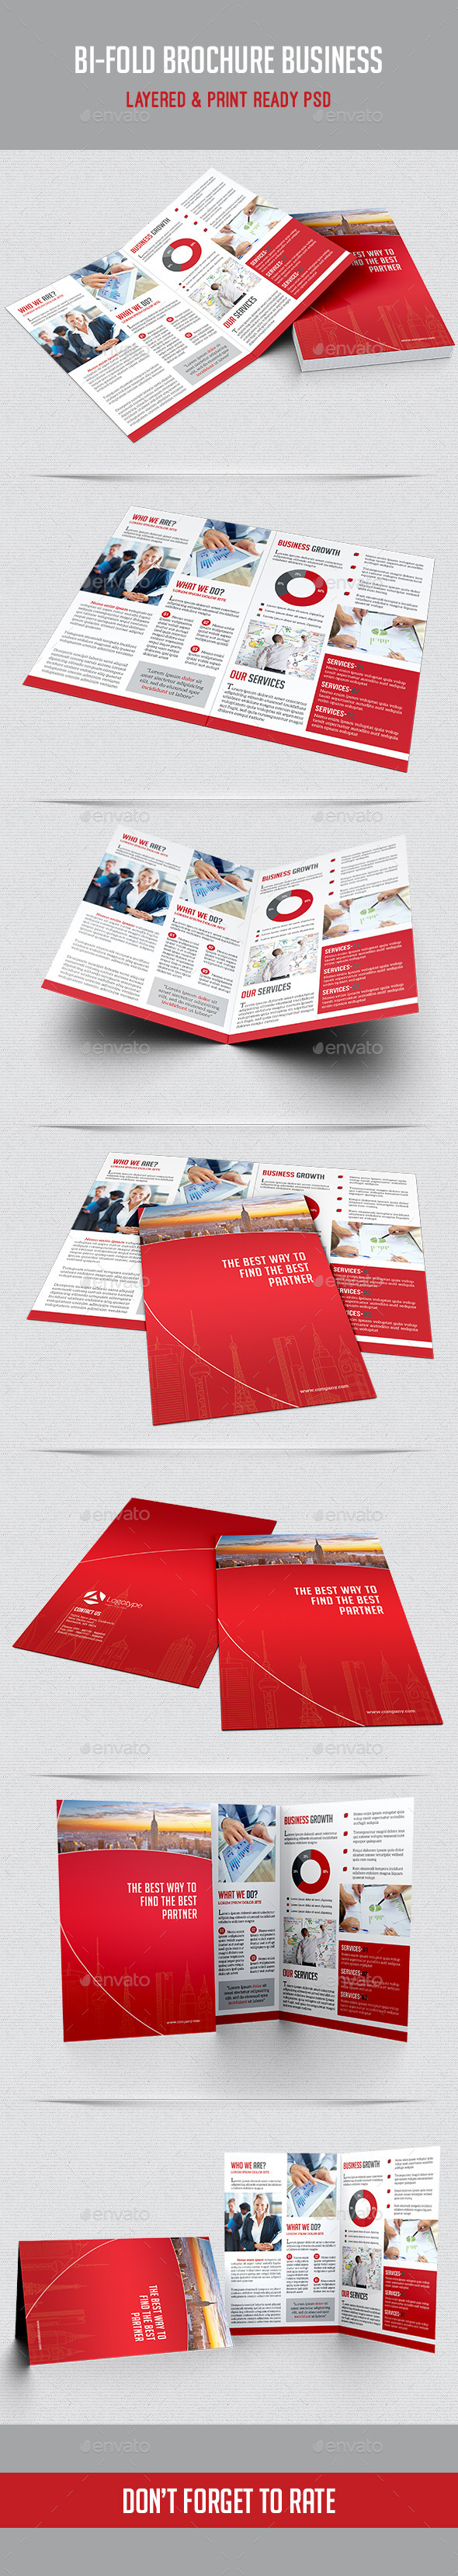 Bi-fold Brochure Business - Corporate Brochures